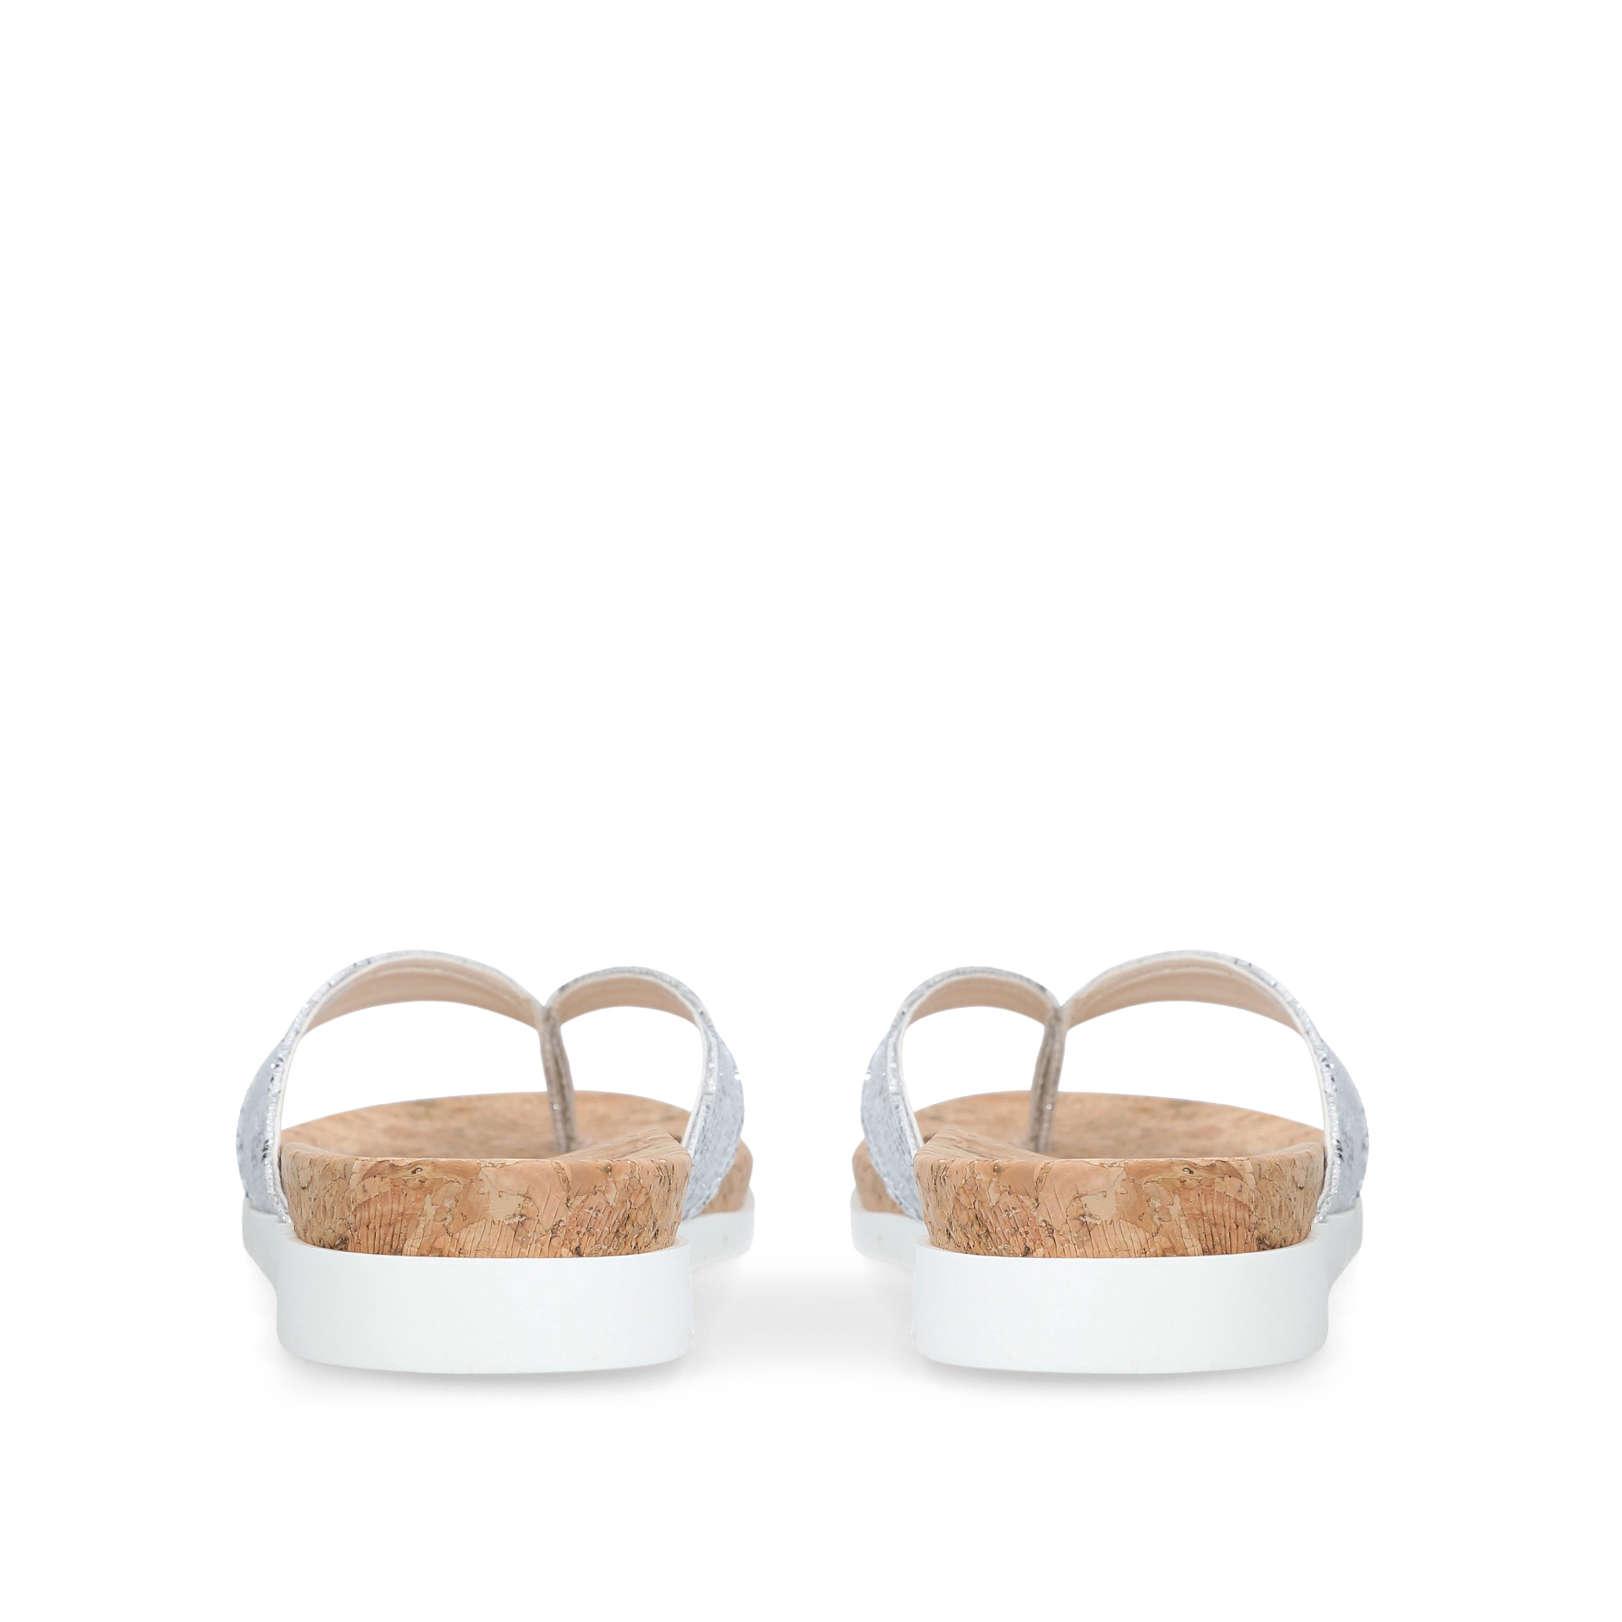 1de3cdbf6 BARB  Carvela Barb Silver Glitter Sandal  by CARVELA